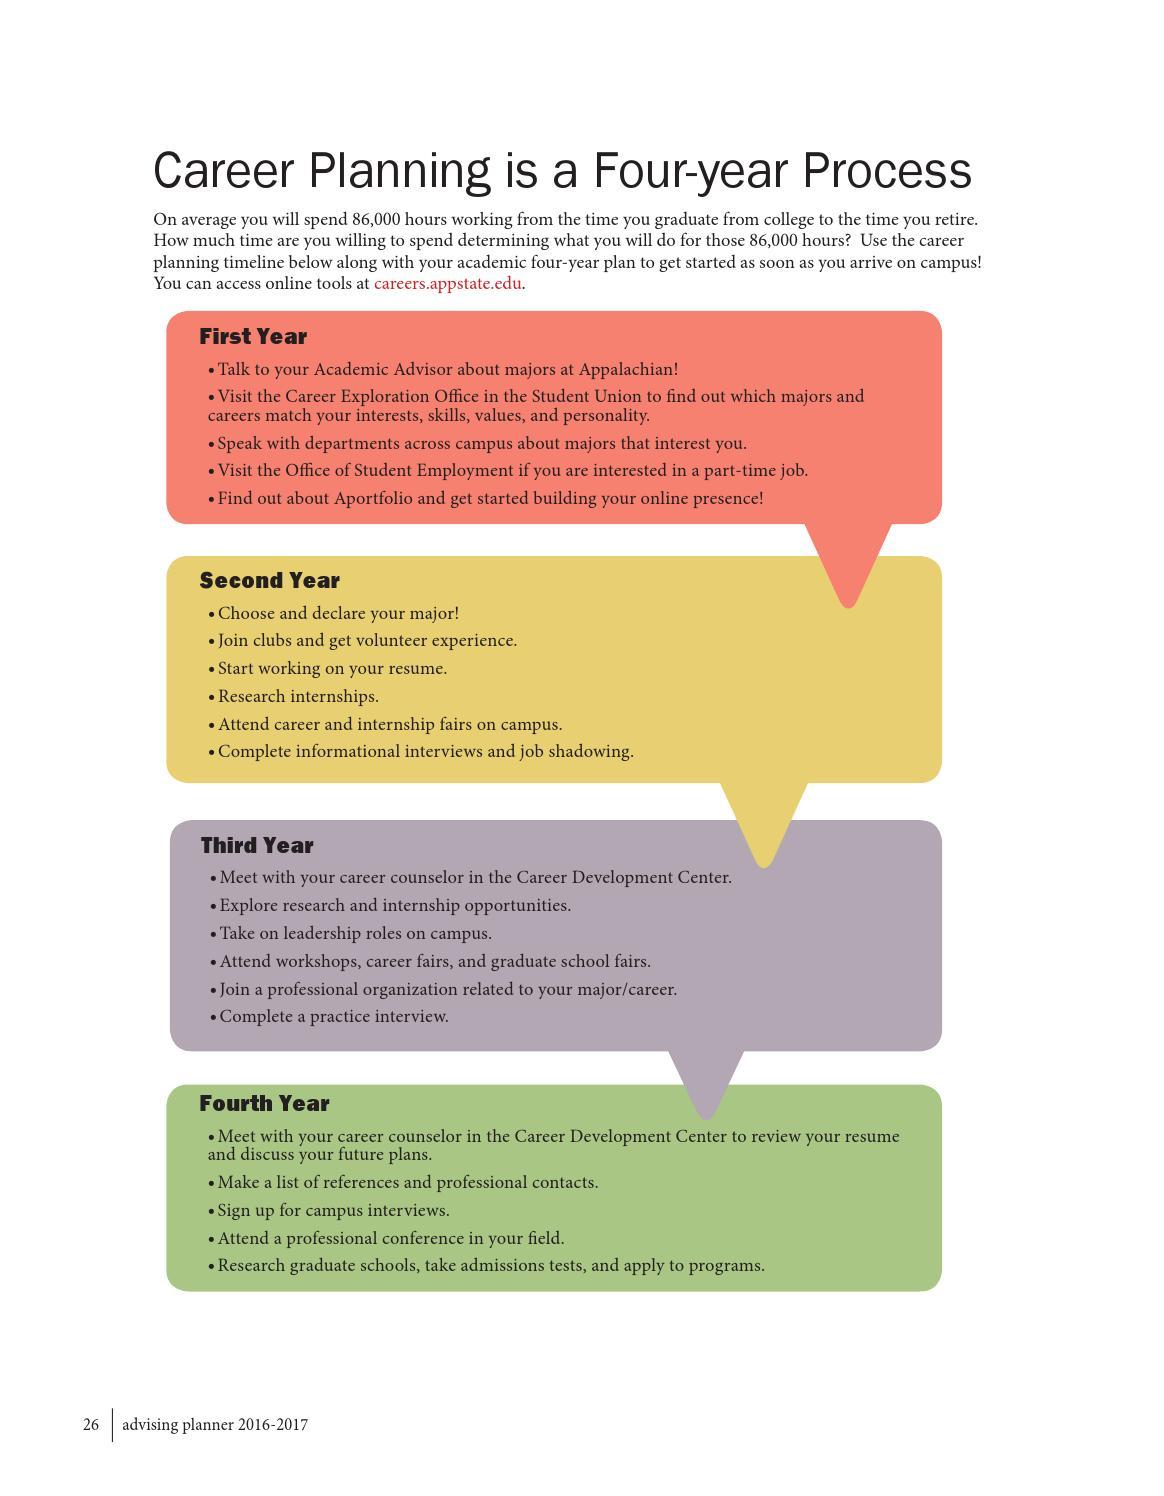 2016 2017 Advising Planner By Nikki Crees Issuu